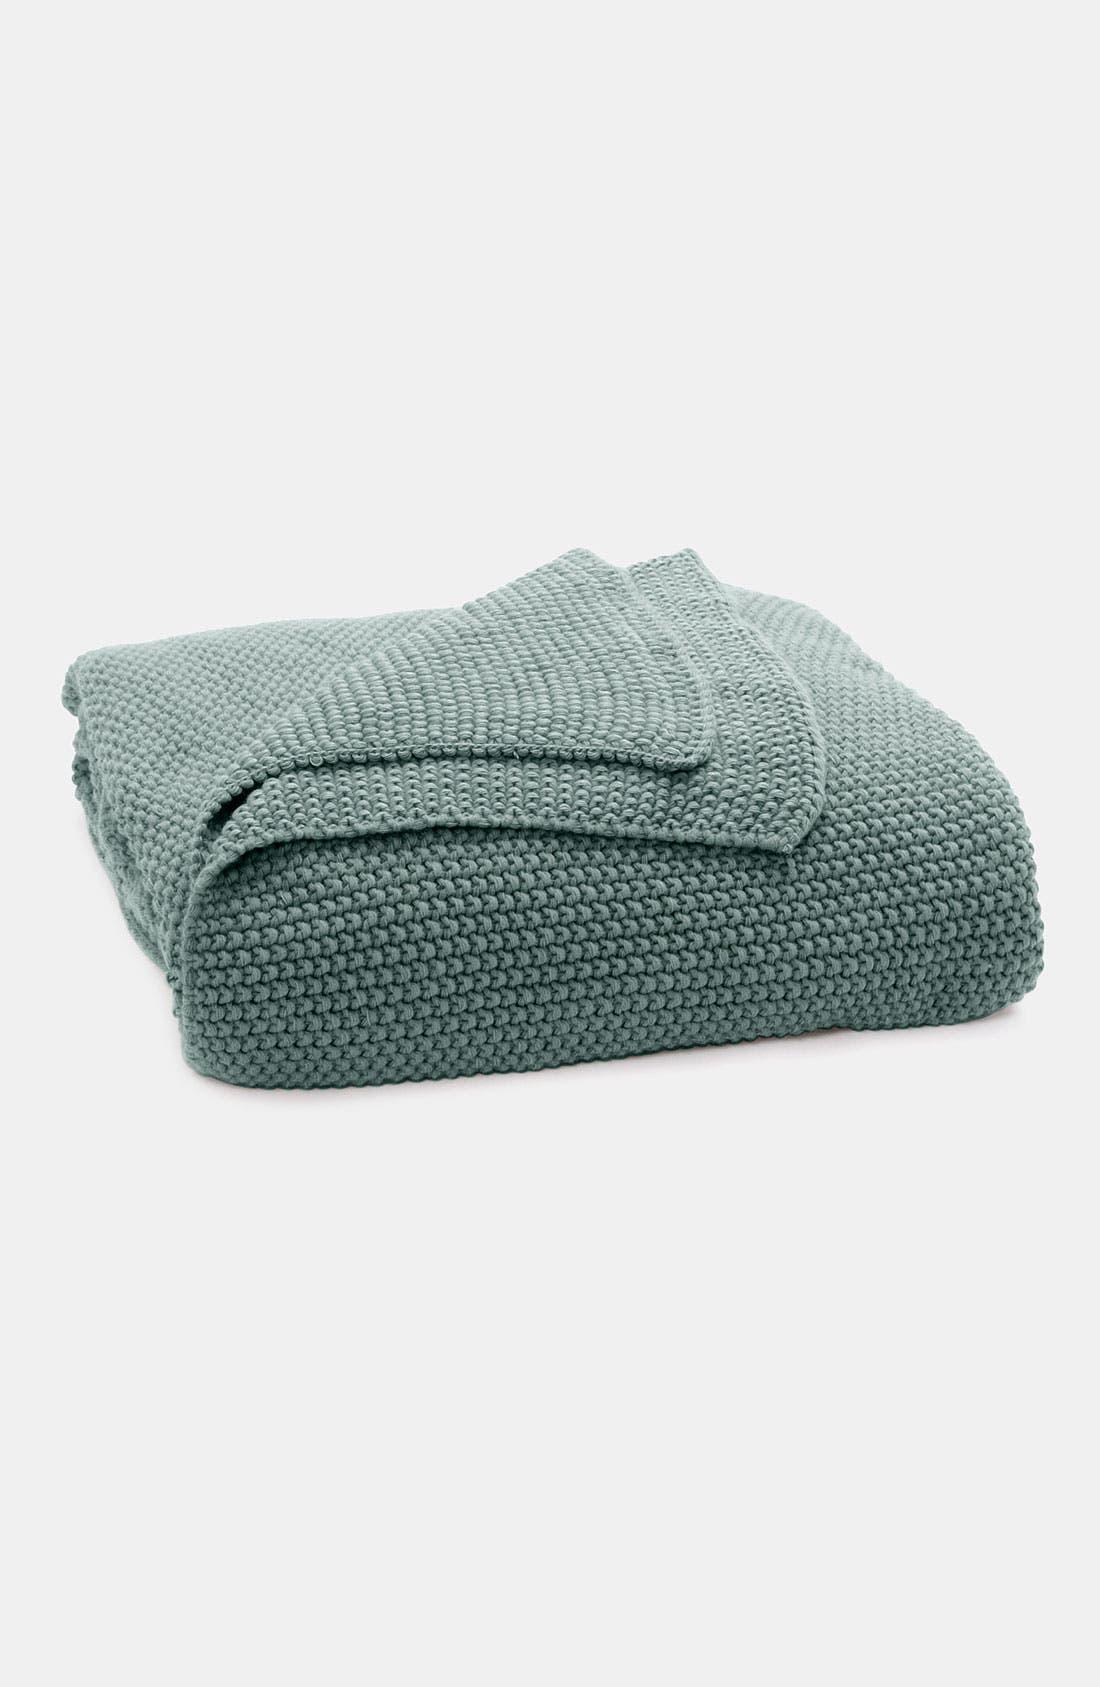 Main Image - Donna Karan 'The Essentials' Knit Throw